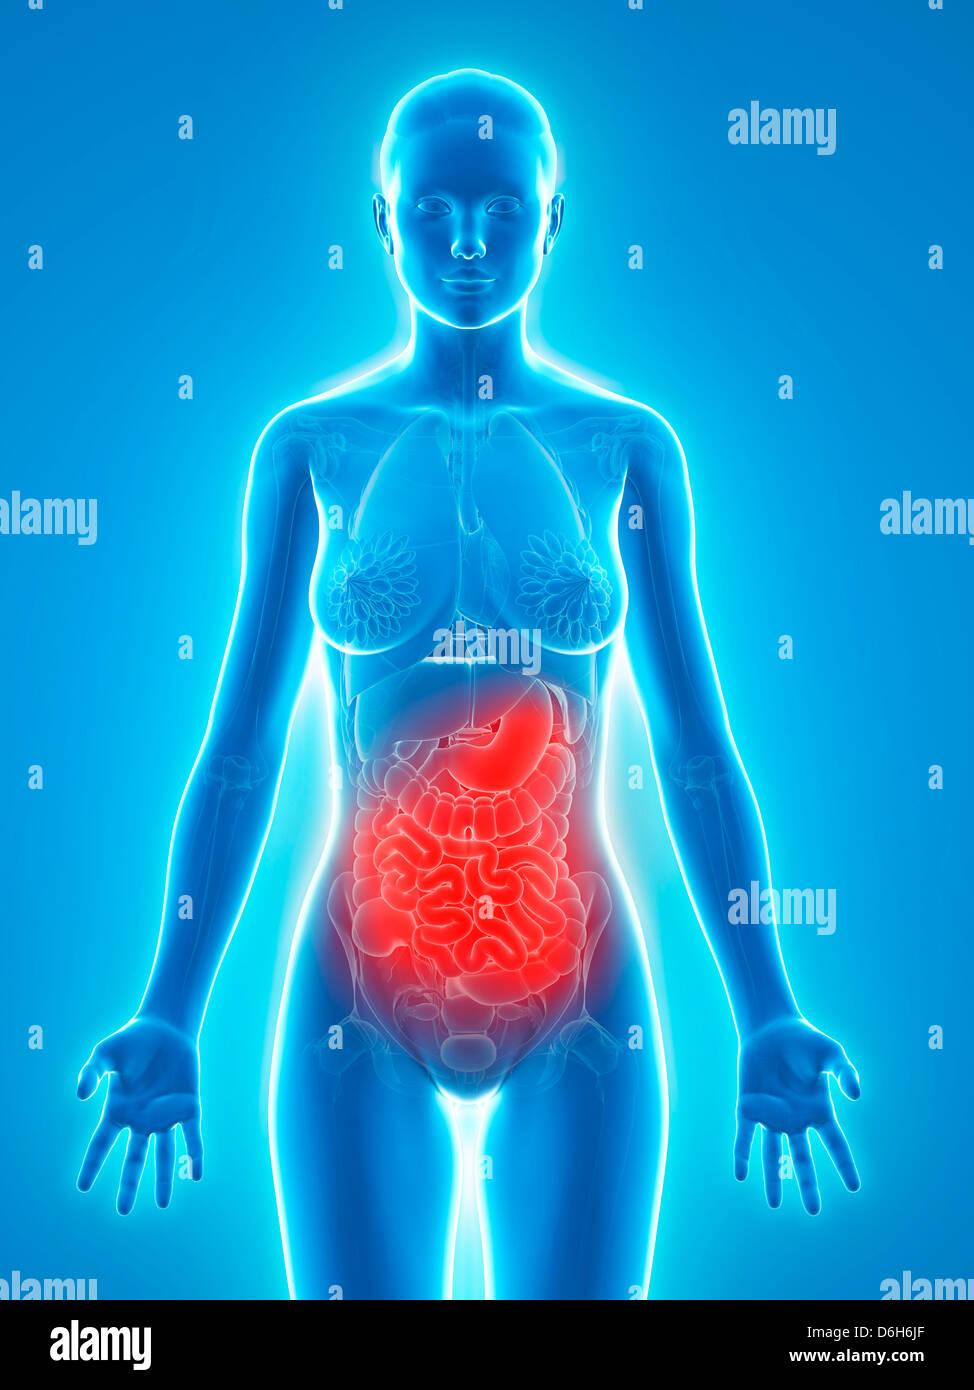 Female Abdominal Anatomy Stock Photos & Female Abdominal Anatomy ...